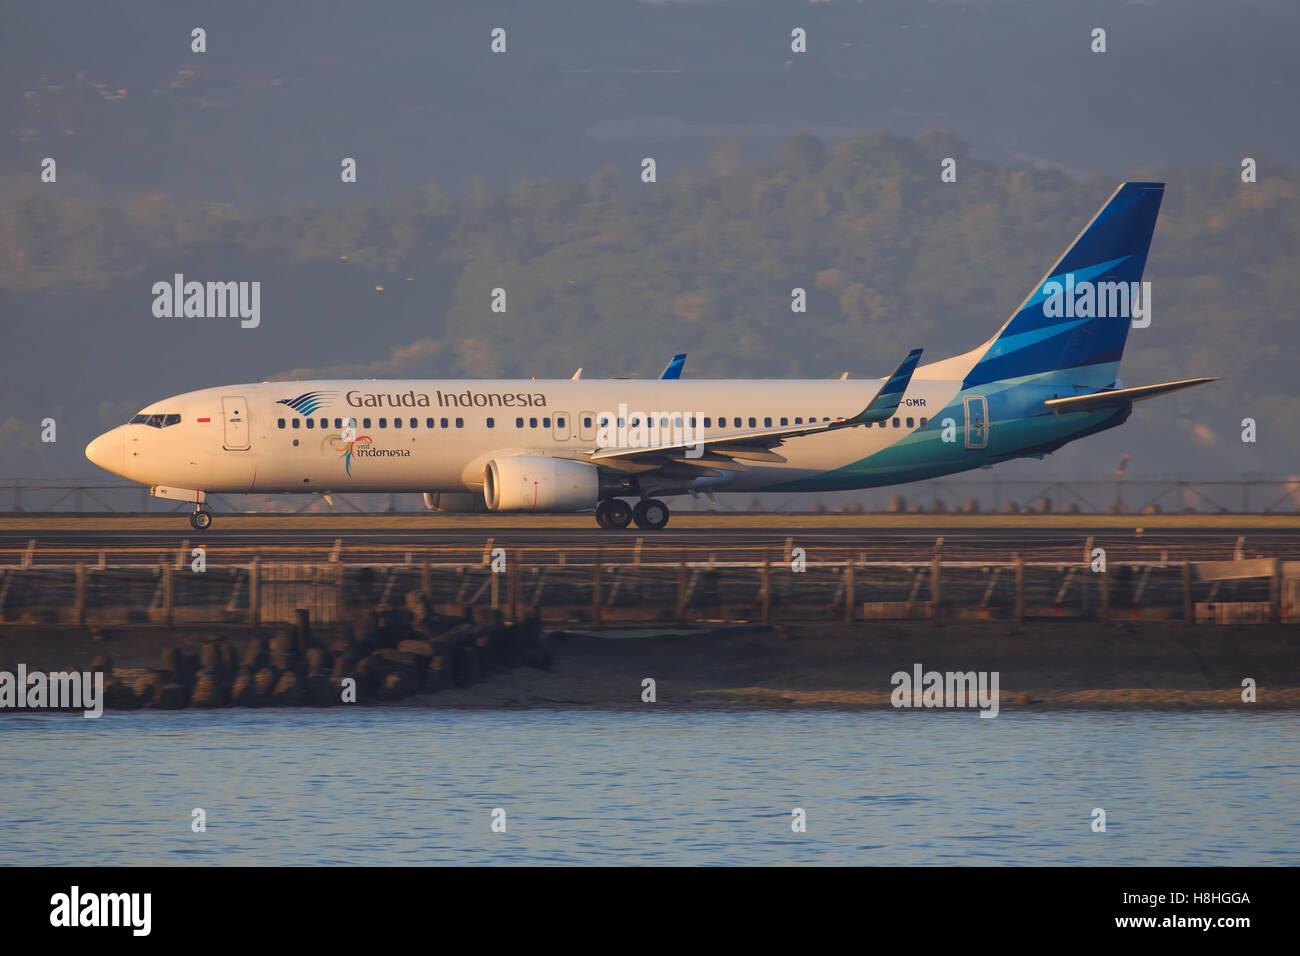 Bali/Indonesia Februar 19, 2013: Boeing 737 from Garuda Indonesia takeoff at Bali Airport. - Stock Image